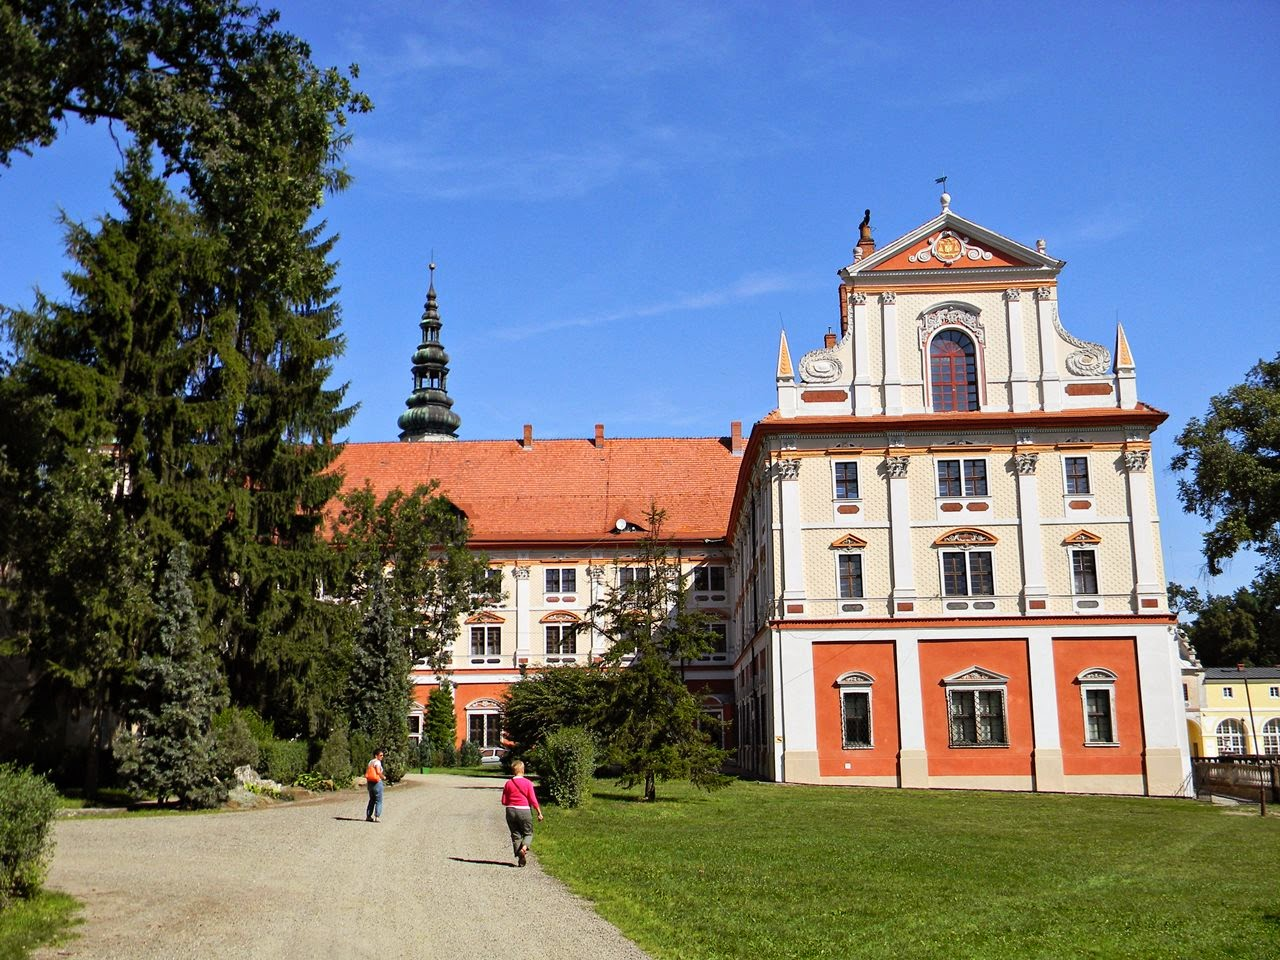 historia, religie, cystersi, Dolny Śląsk